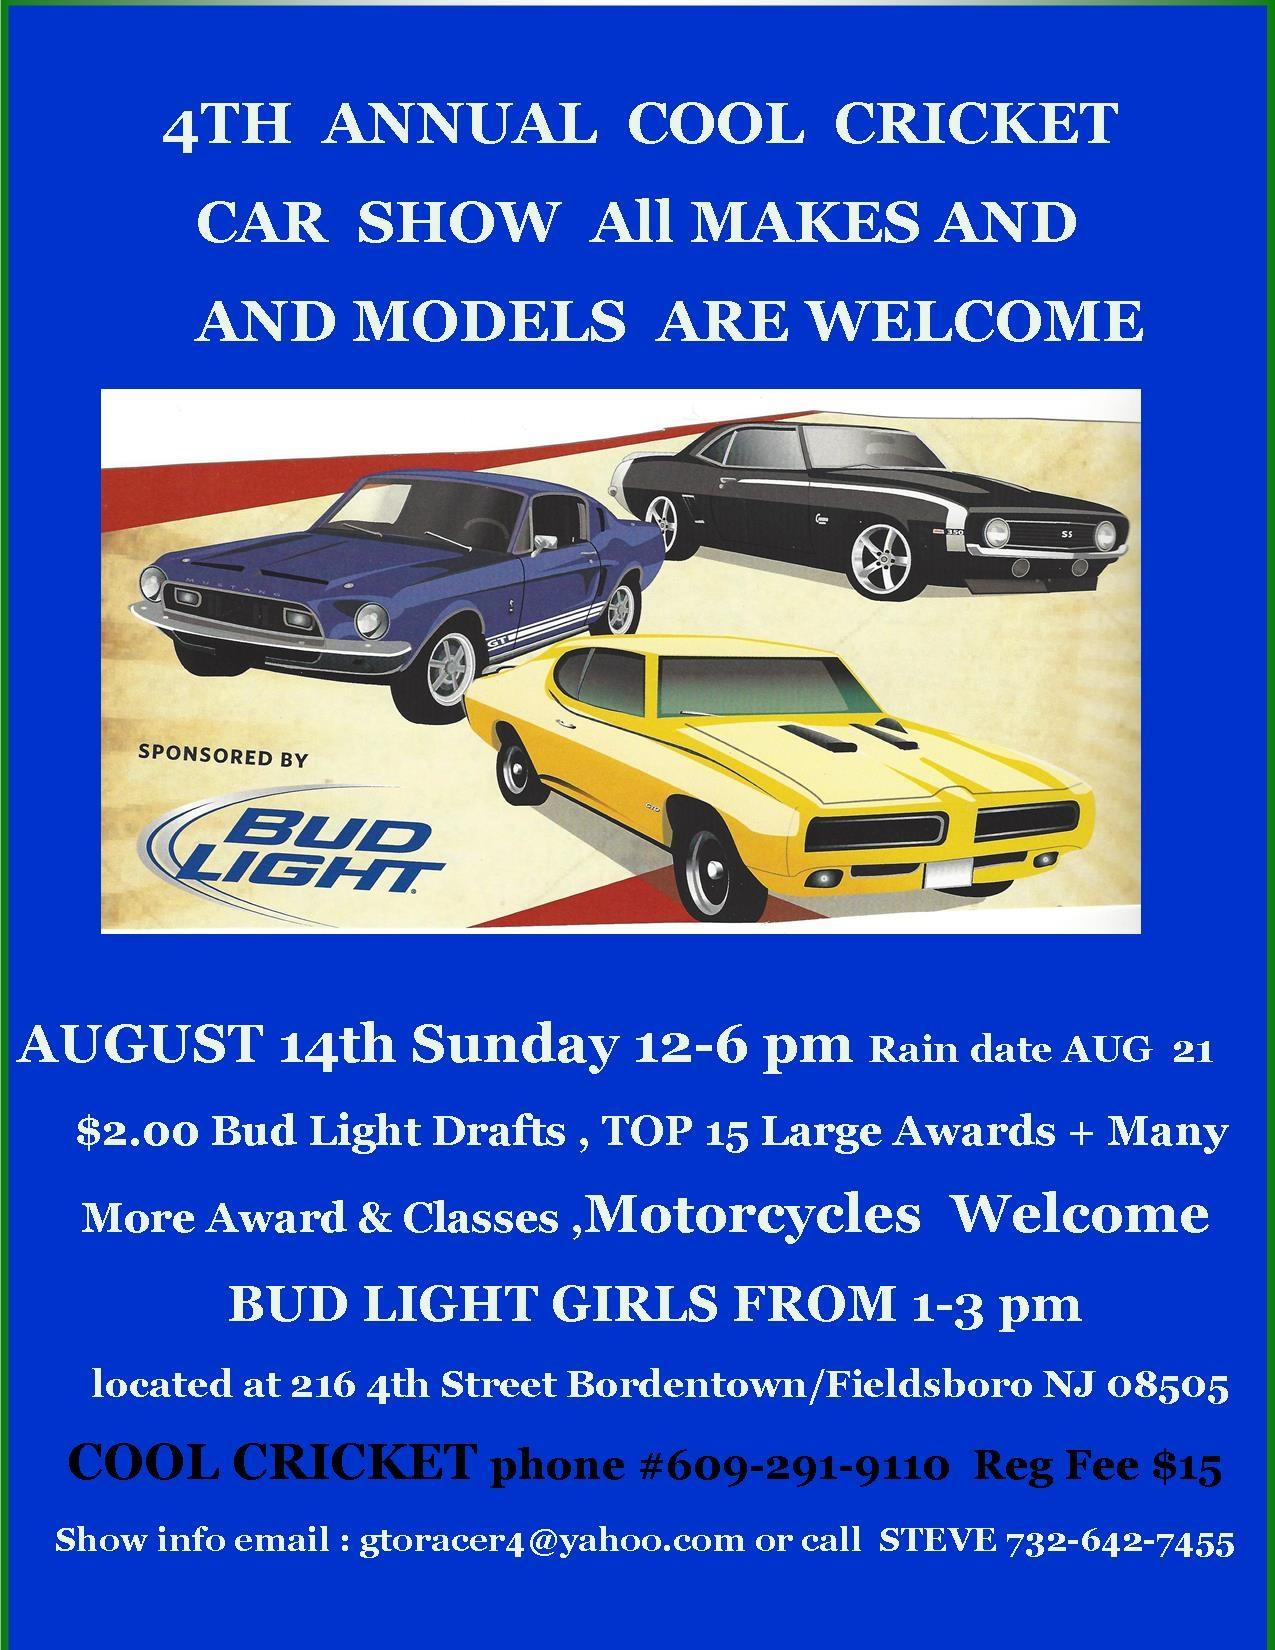 Th ANNUAL COOL CRICKET CAR BIKE SHOW AUGUST Th LSGTOcom Forums - Fun car show award categories